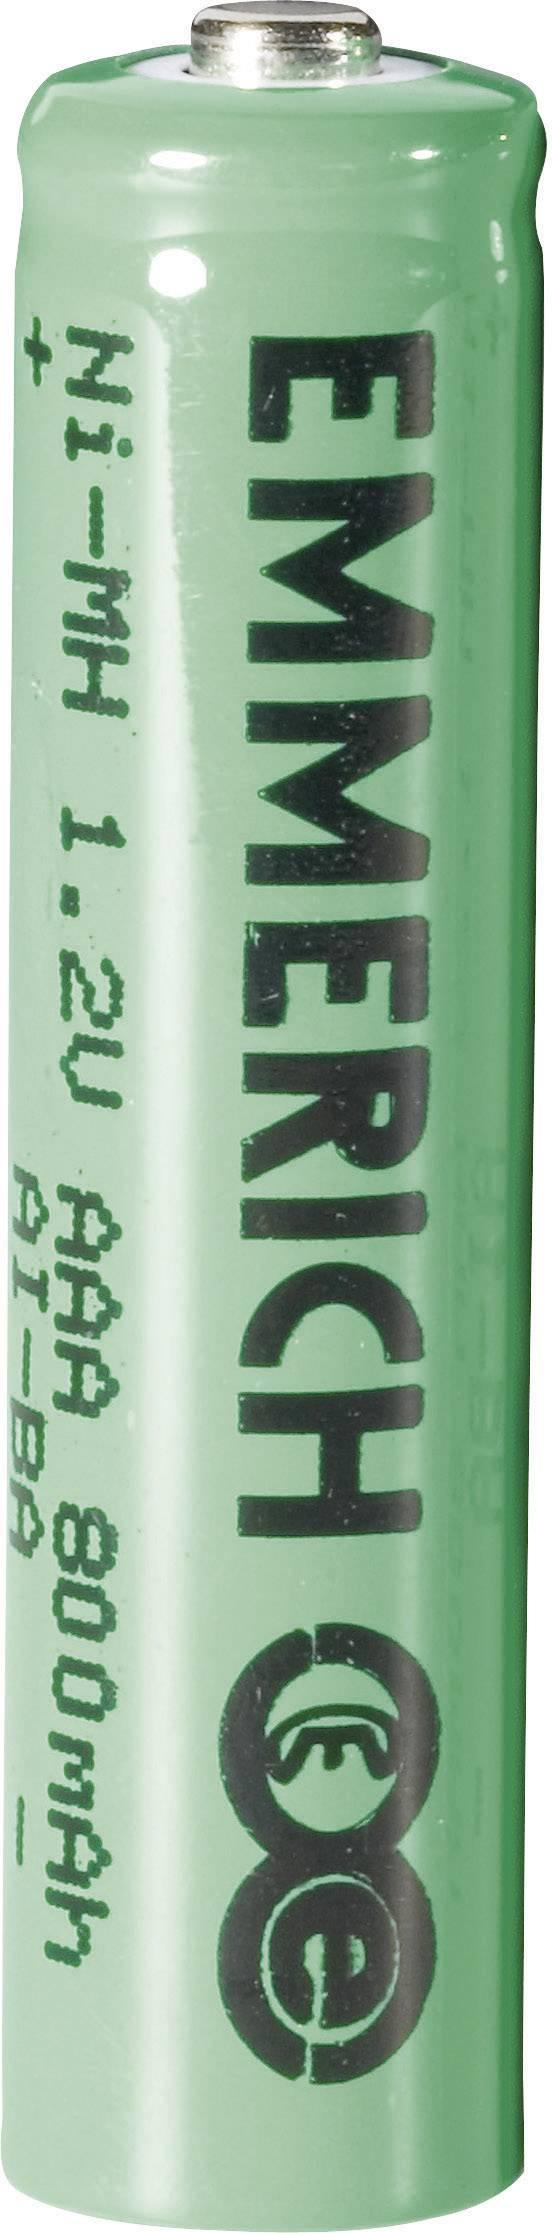 Mikrotužkový akumulátor typu AAA NiMH Emmerich HR03 255013, 800 mAh, 1.2 V, 1 ks